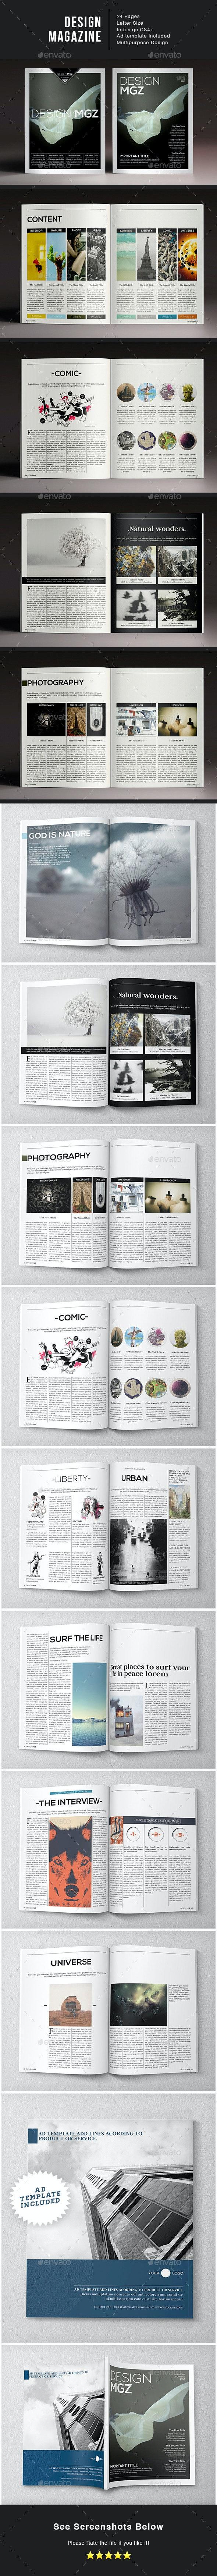 Design Magazine - Magazines Print Templates